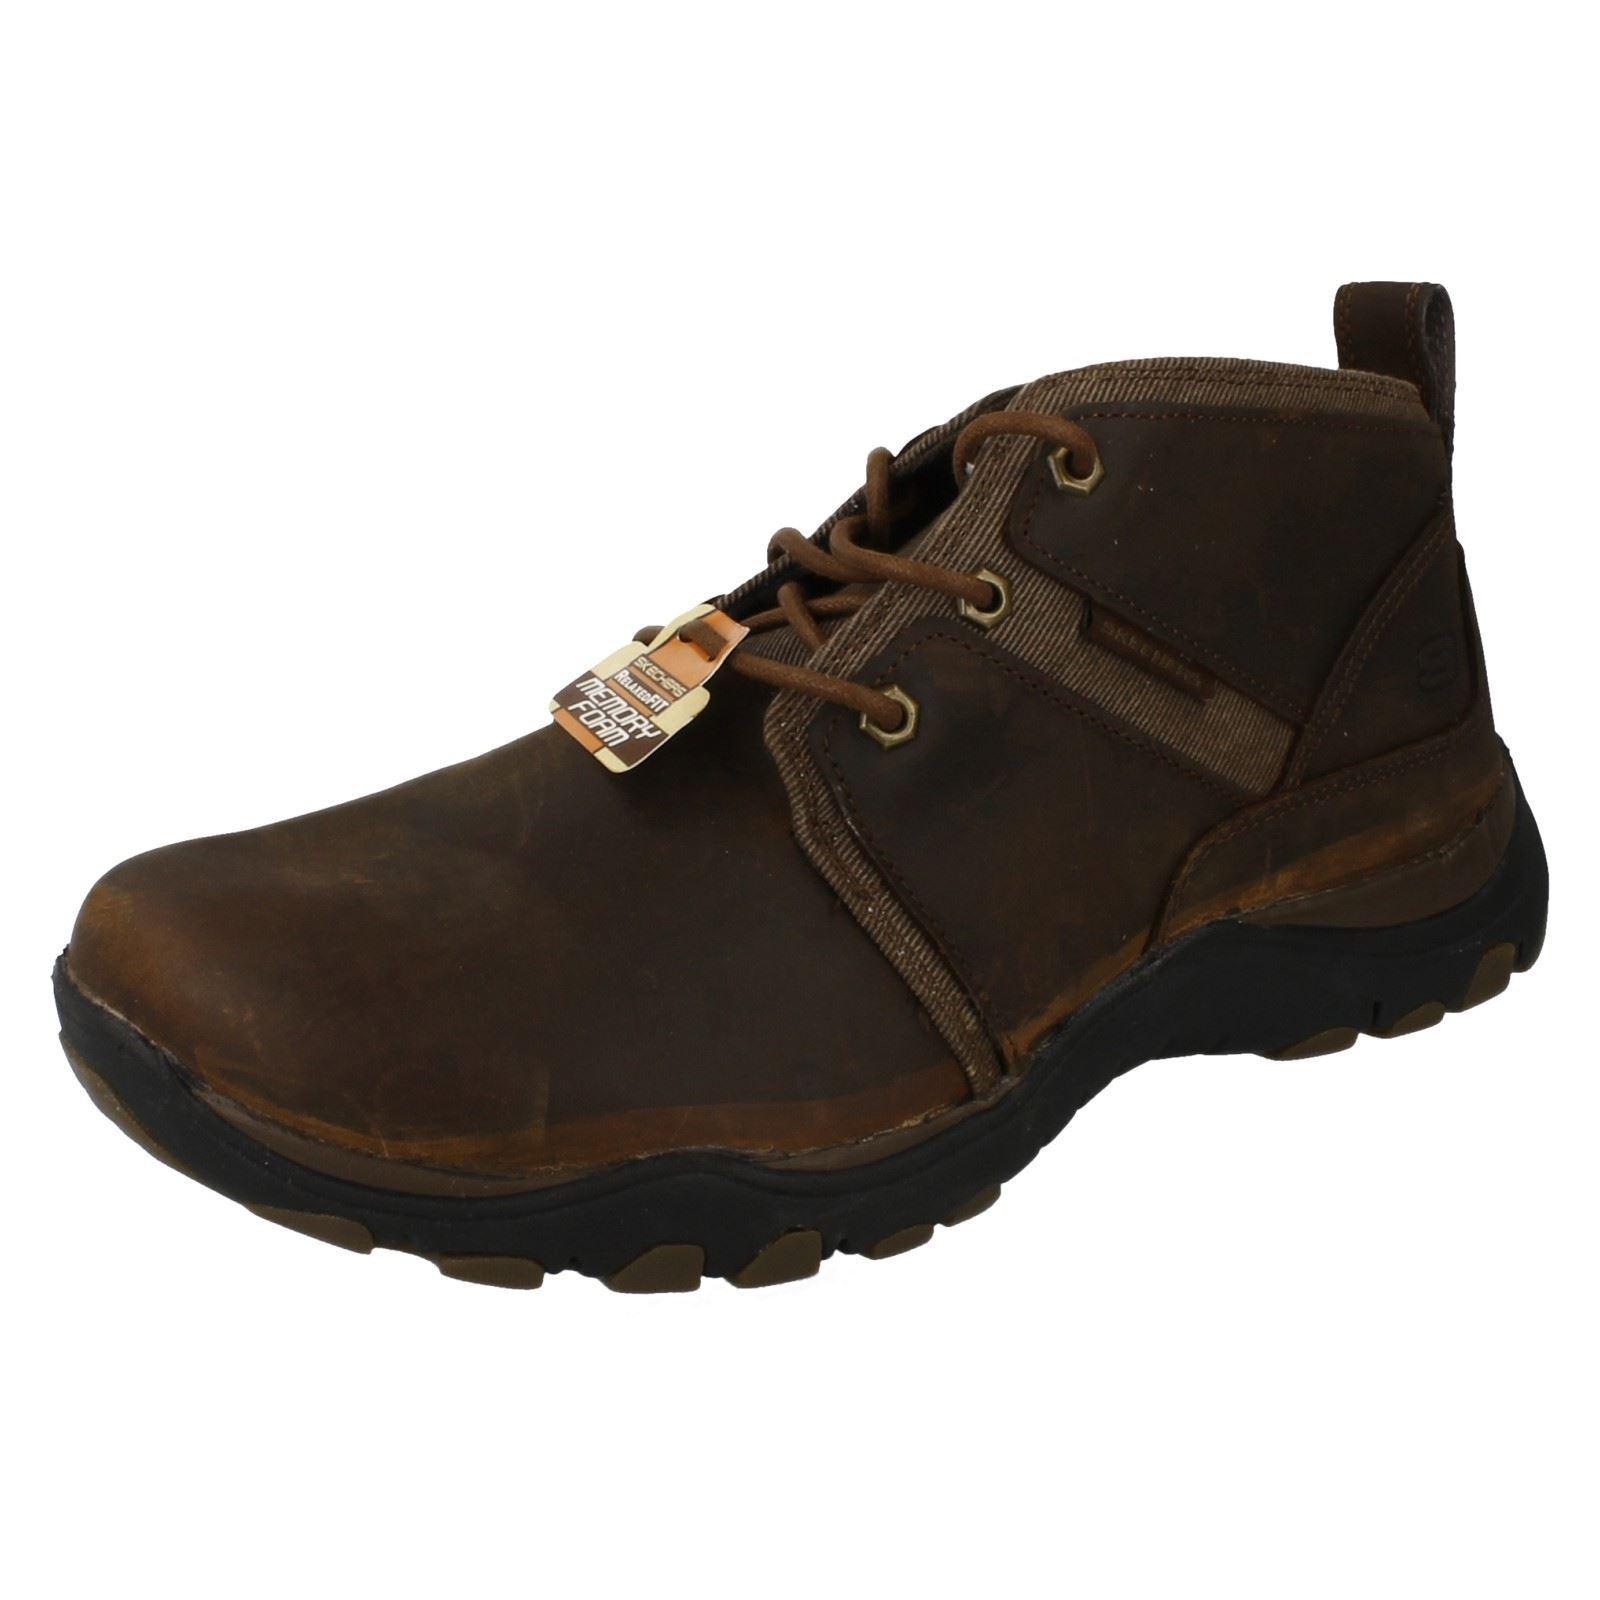 Mens Skechers Casual Shoes - Lutador